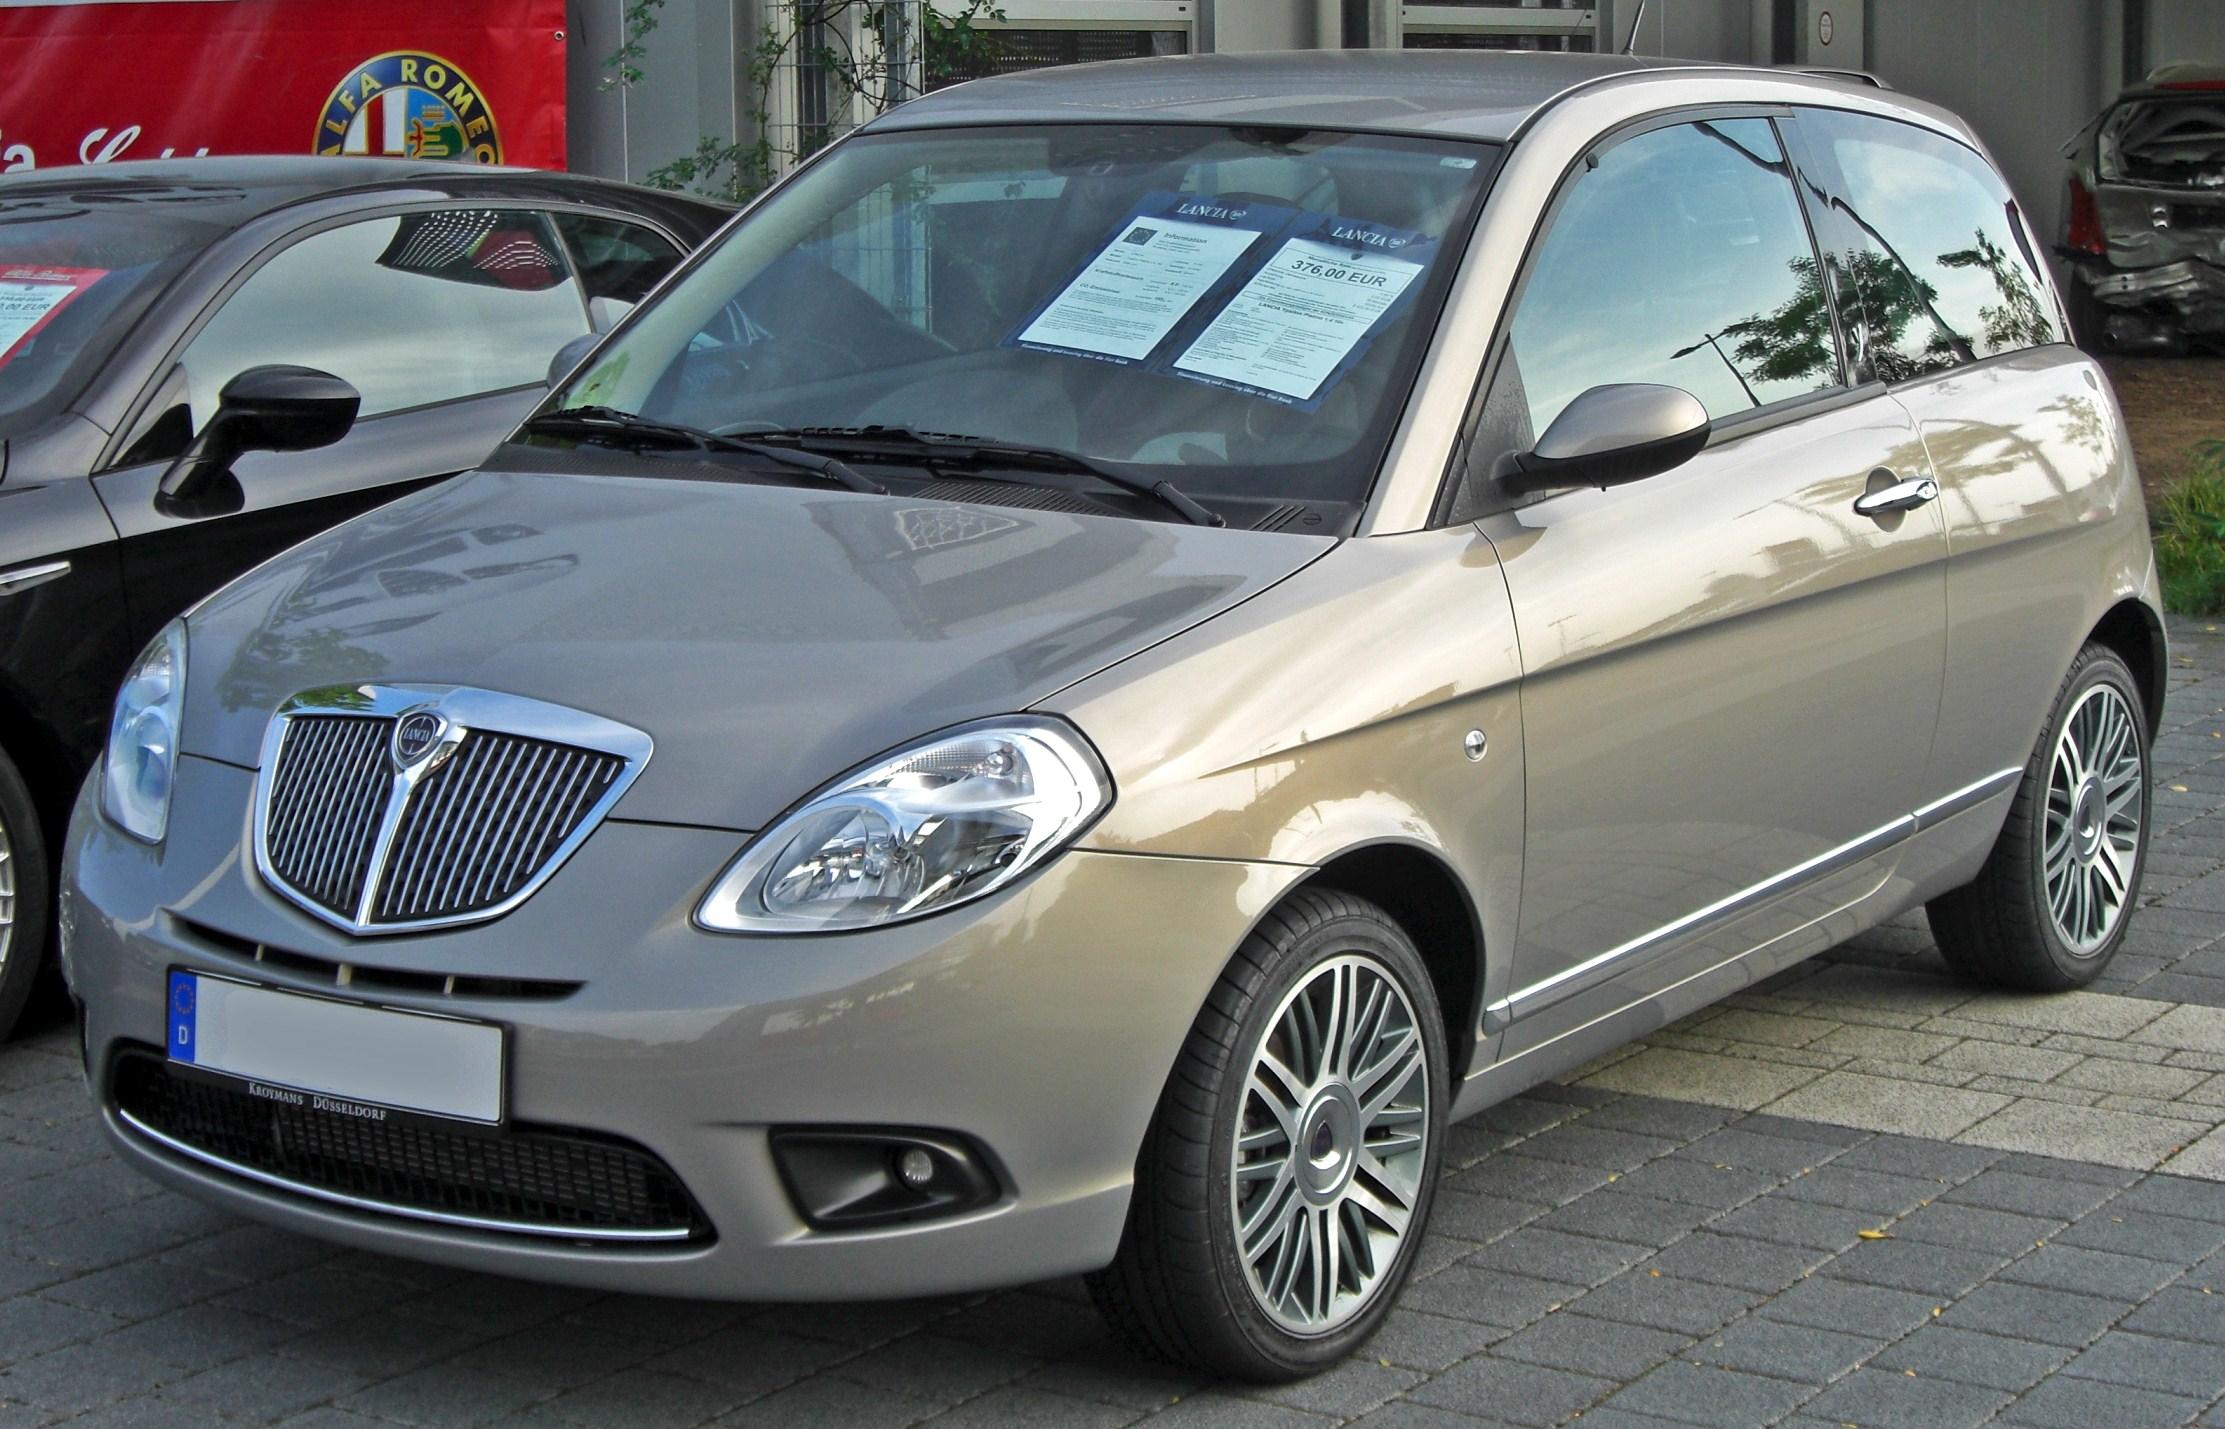 https://upload.wikimedia.org/wikipedia/commons/0/0d/Lancia_Ypsilon_Facelift_front.JPG